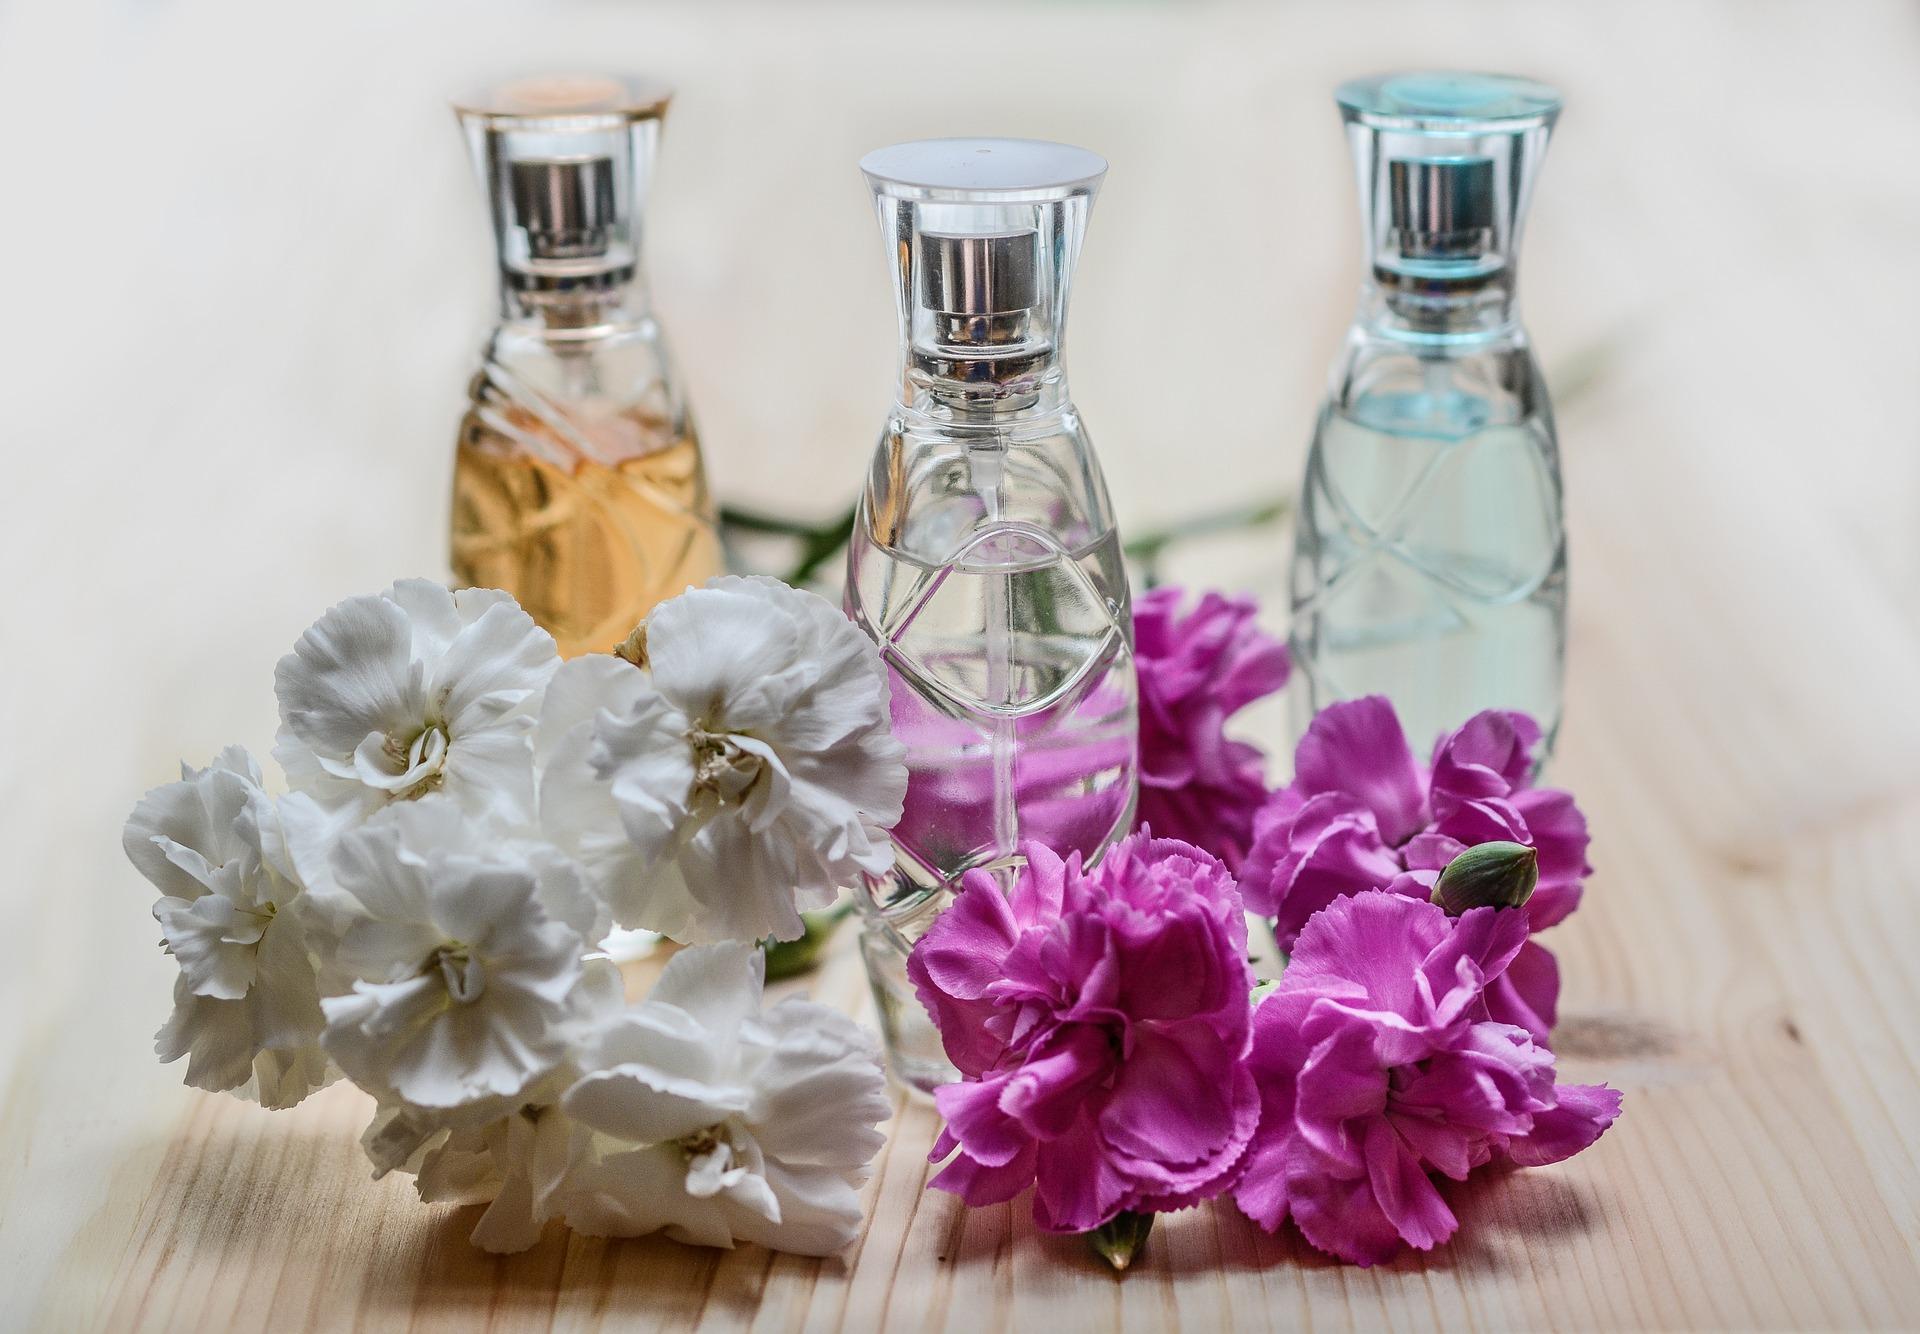 perfume-1433653_1920.jpg